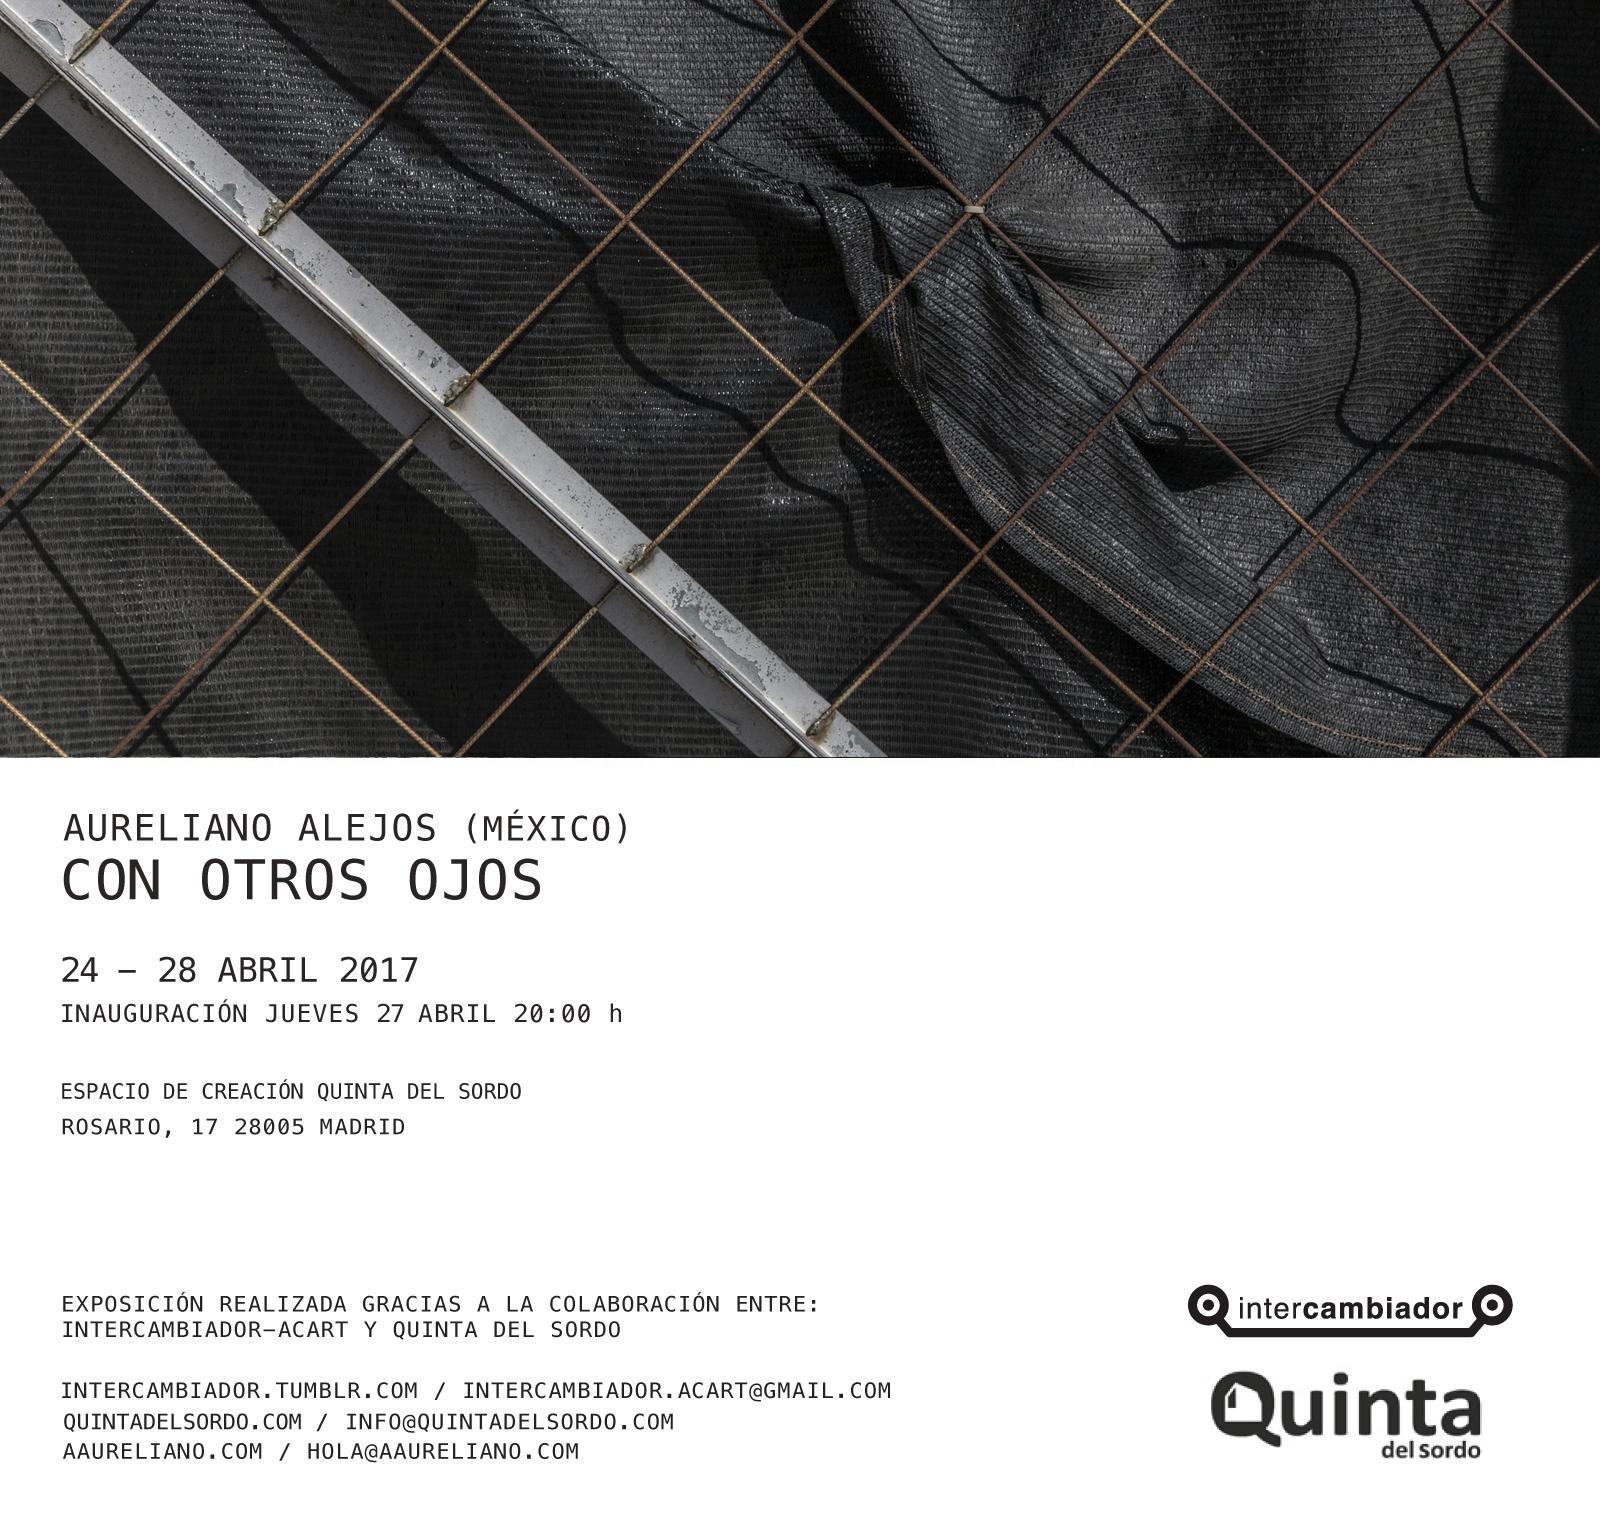 AurelianoAlejos_FLYER_digital